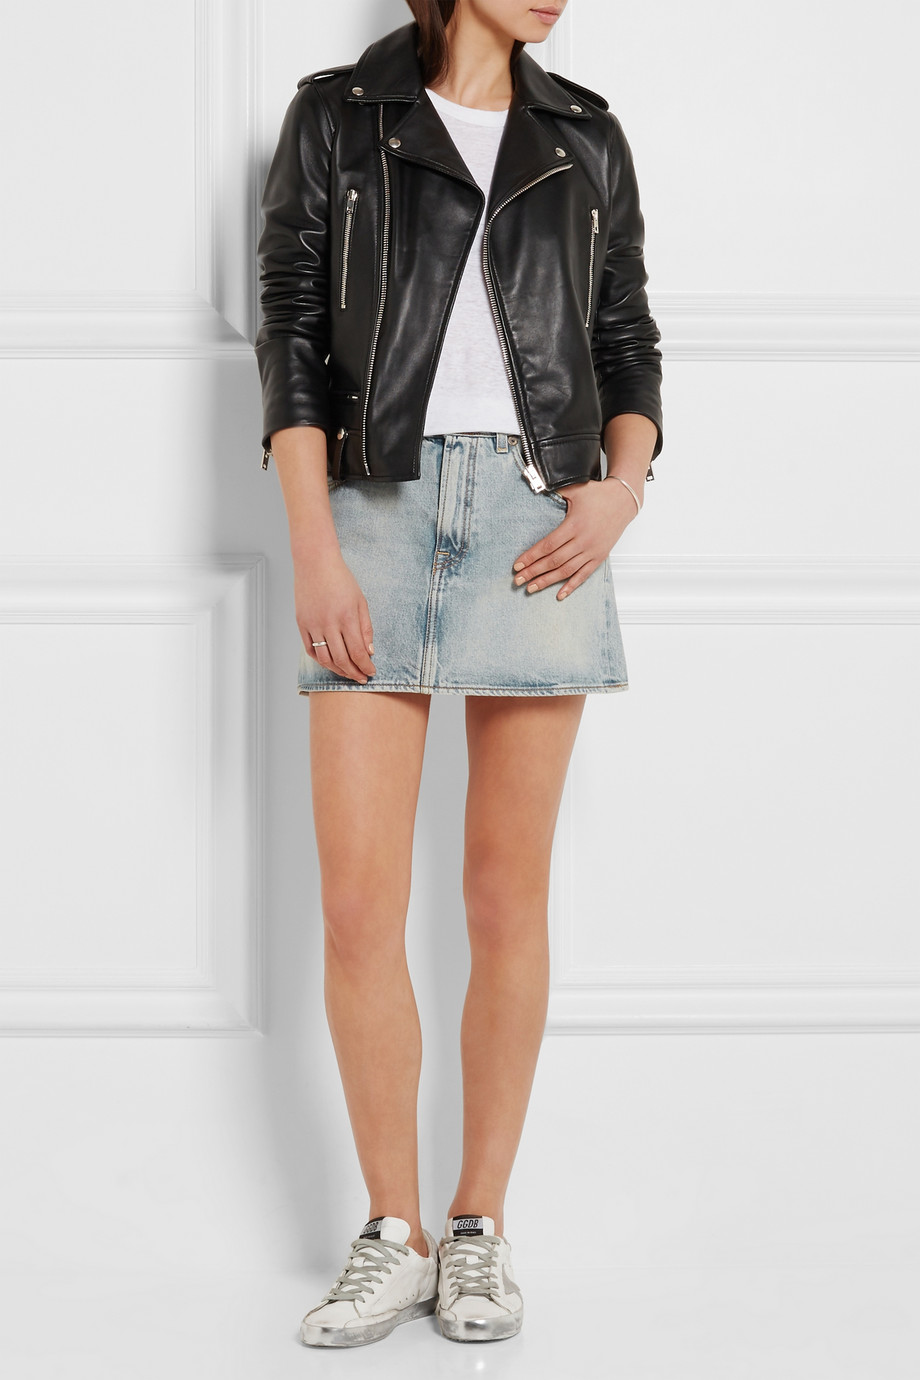 denim skirt style 5